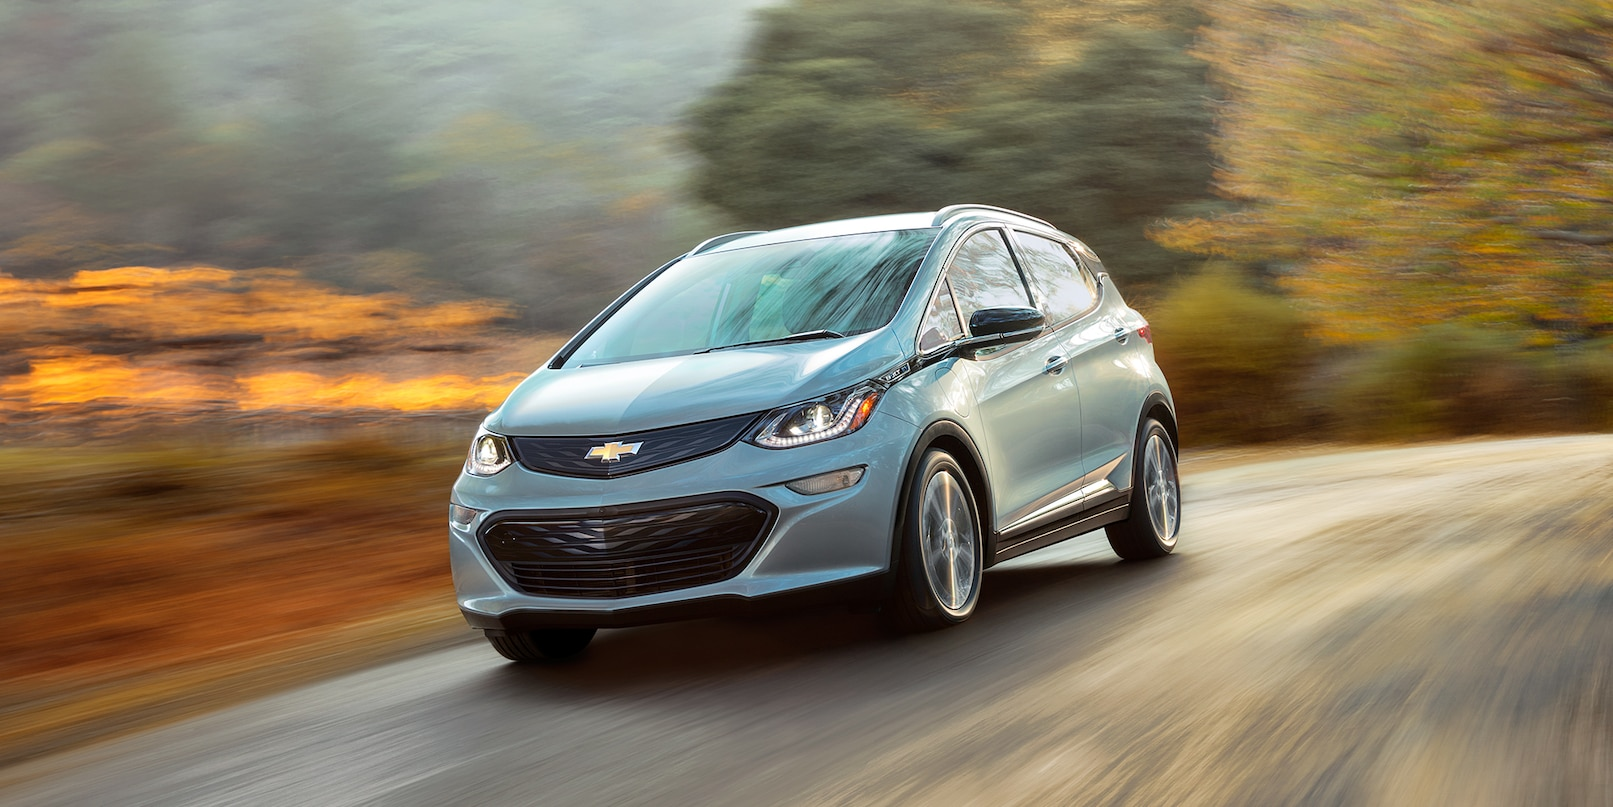 2018 Chevrolet Bolt EV Leasing in Elk Grove, CA